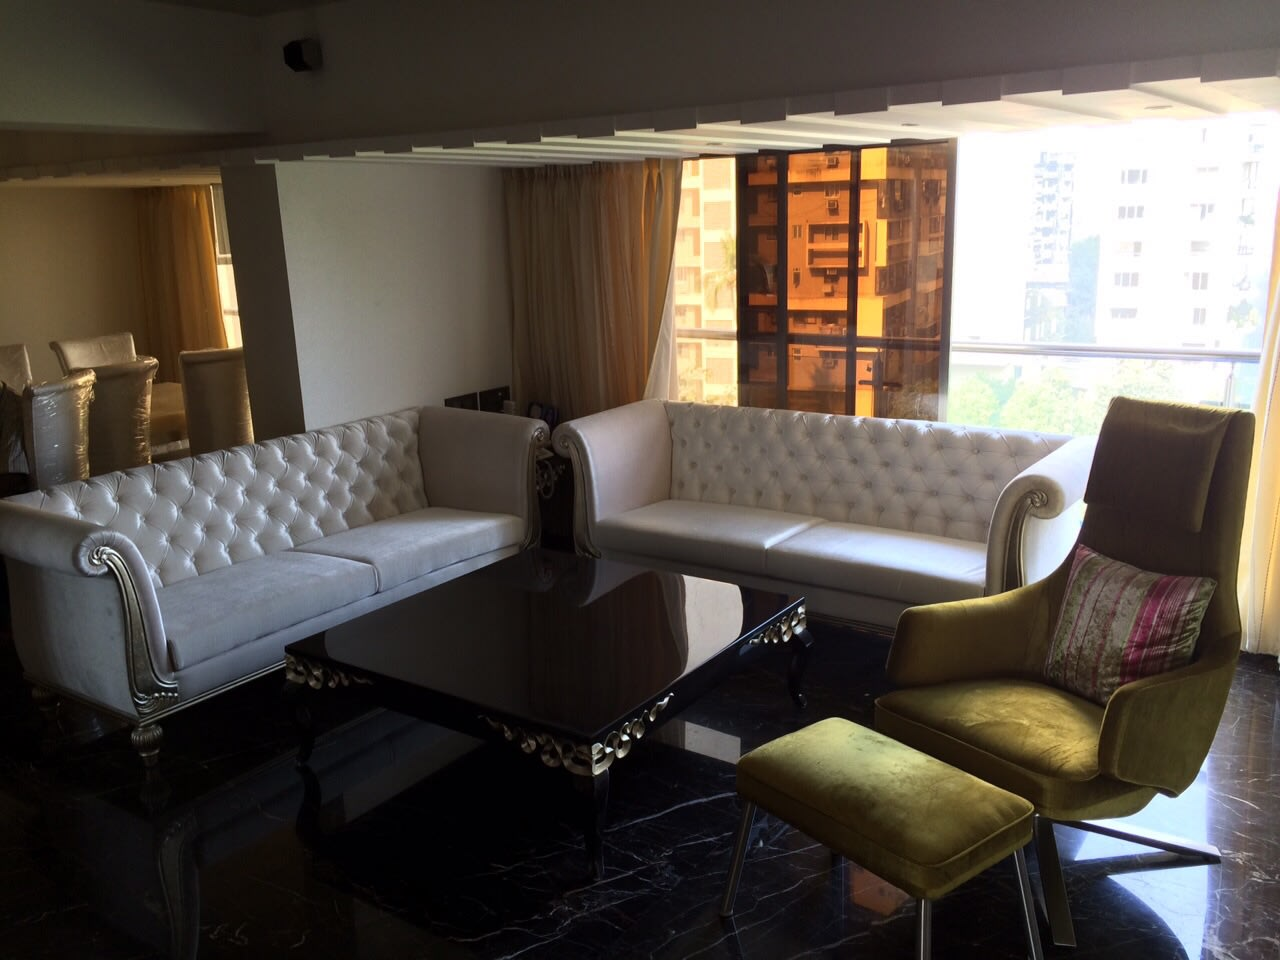 Plush living room decor ideas by ARCHITECT KAUSHAL CHOUHAN Living-room | Interior Design Photos & Ideas